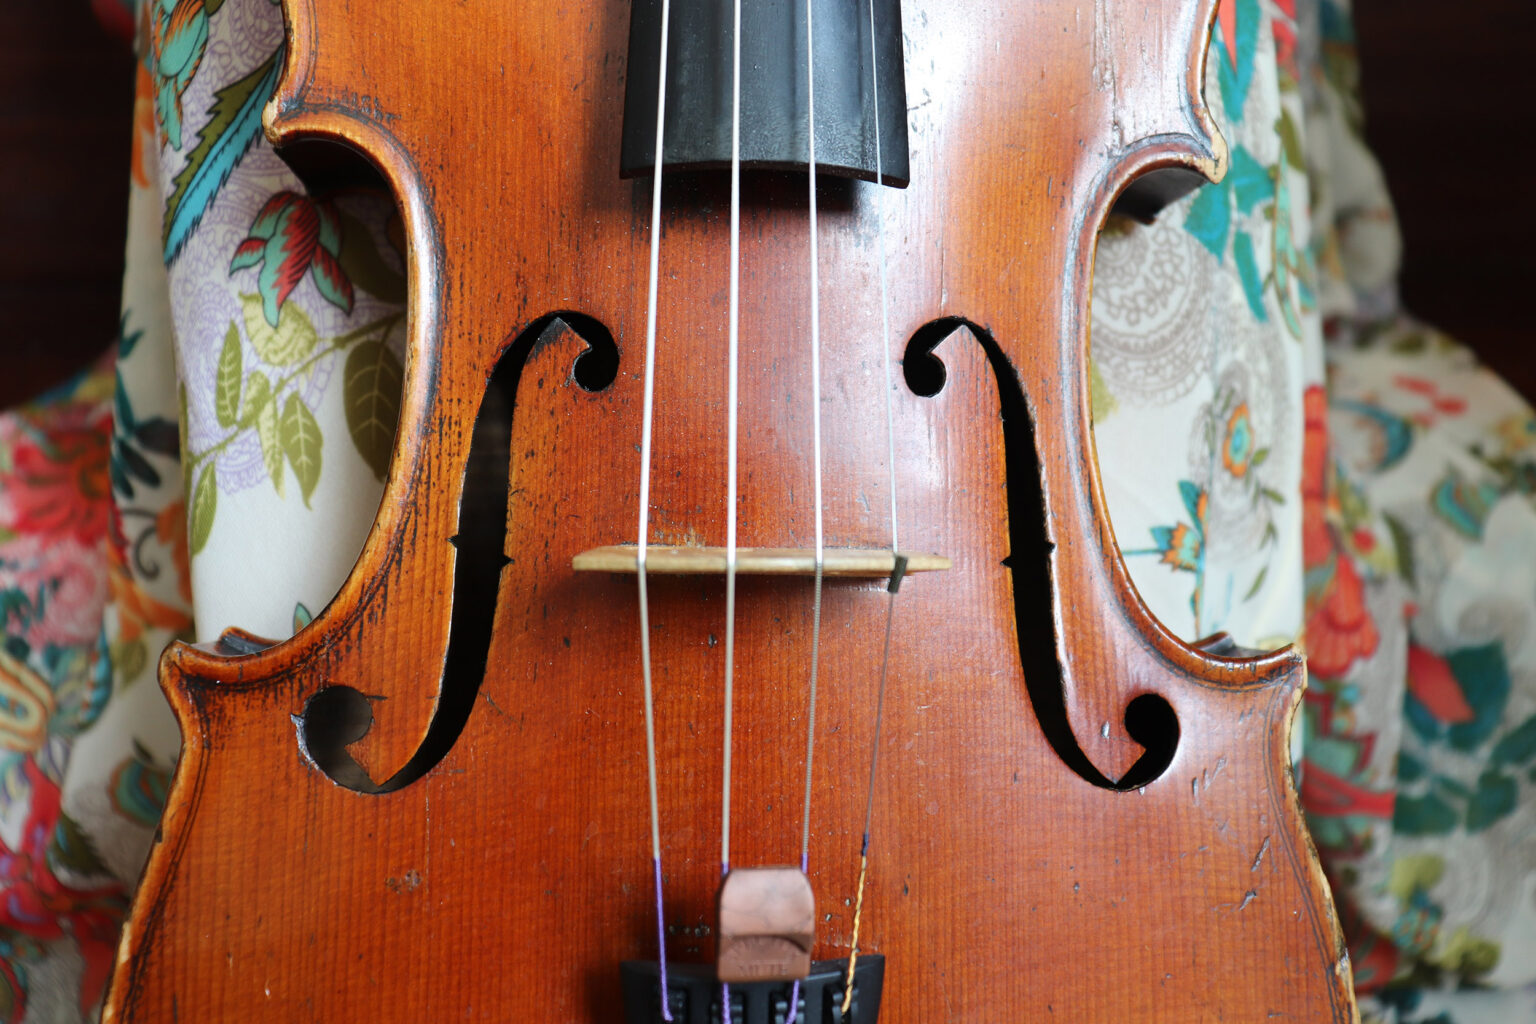 viola and dress